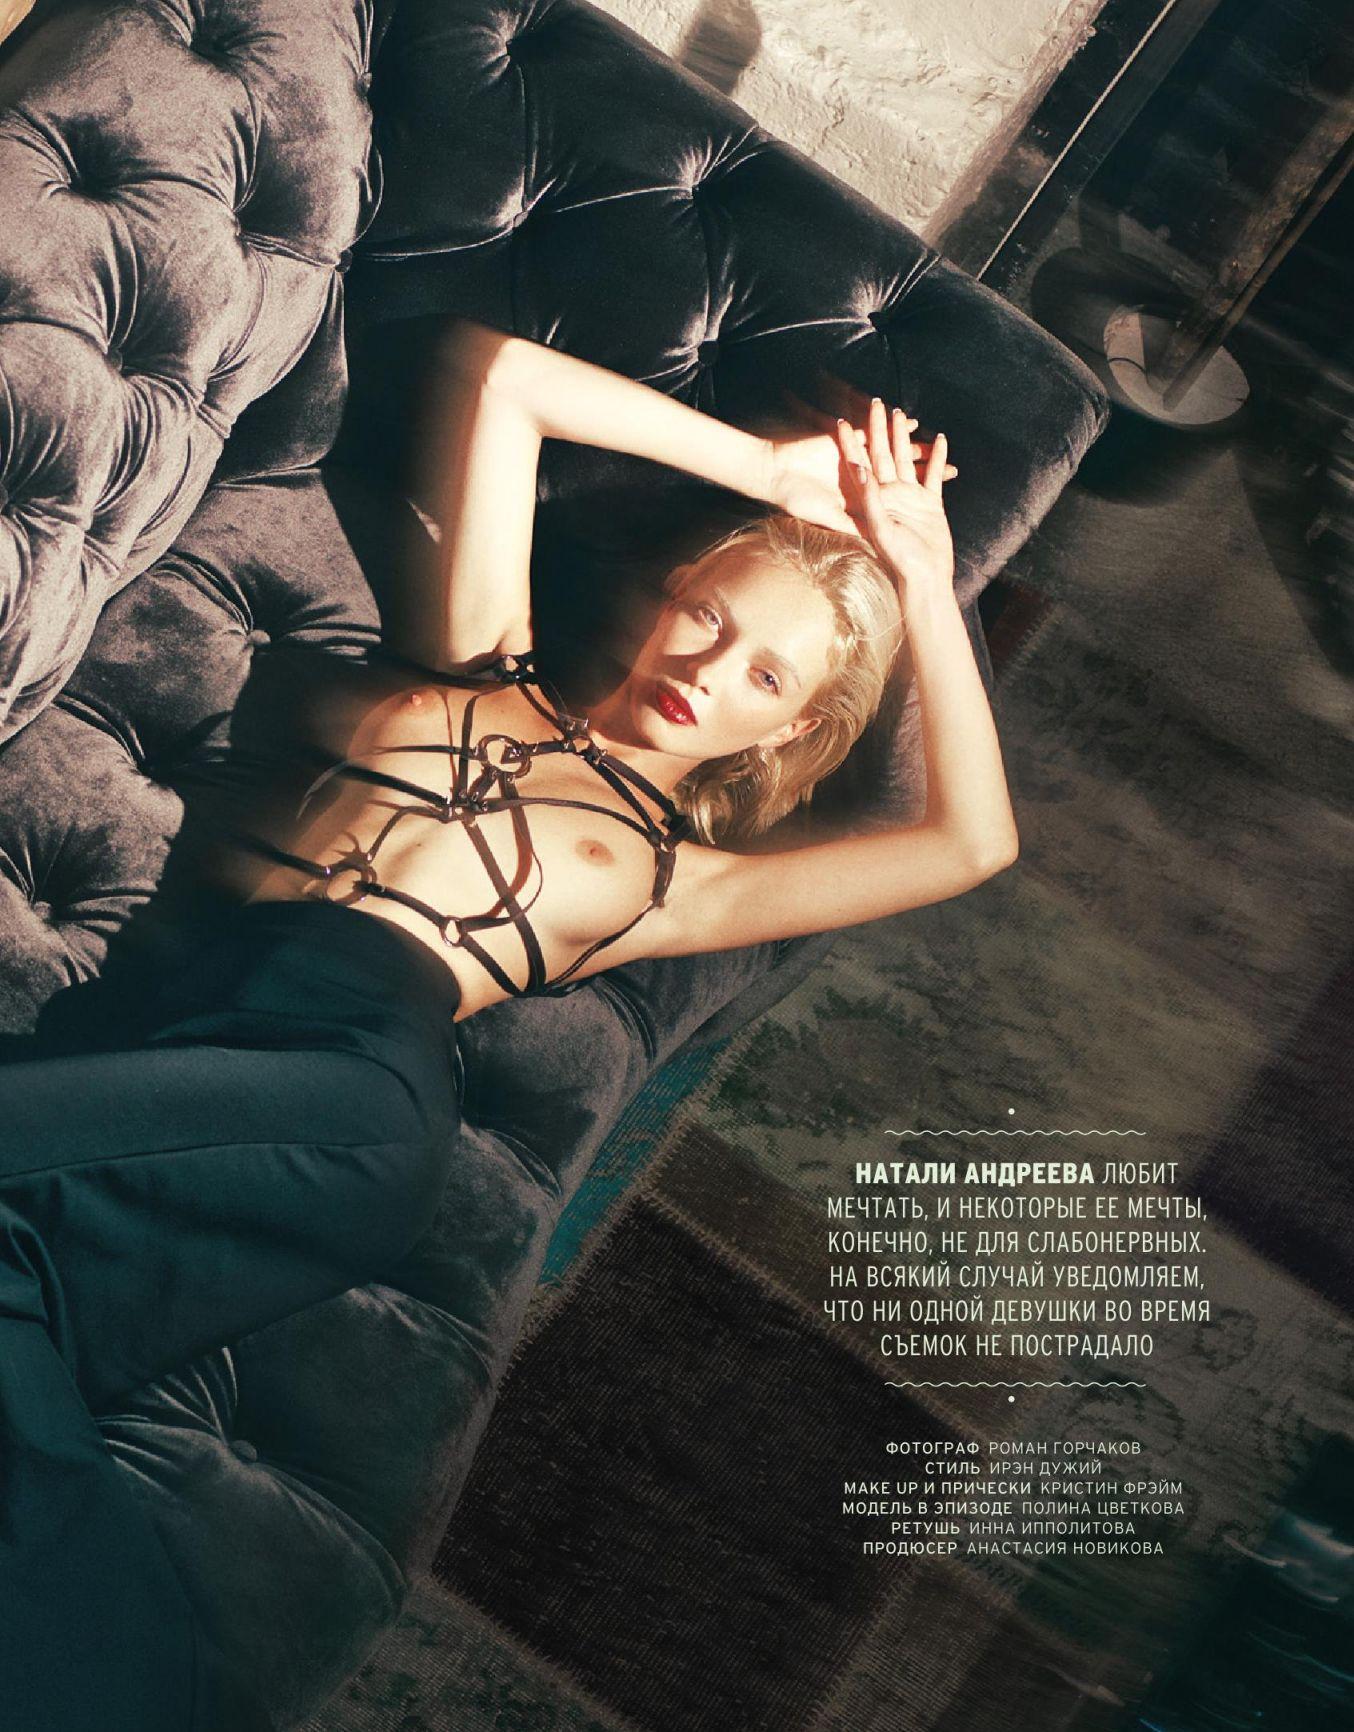 Natalie Andreeva nude photos  (1)